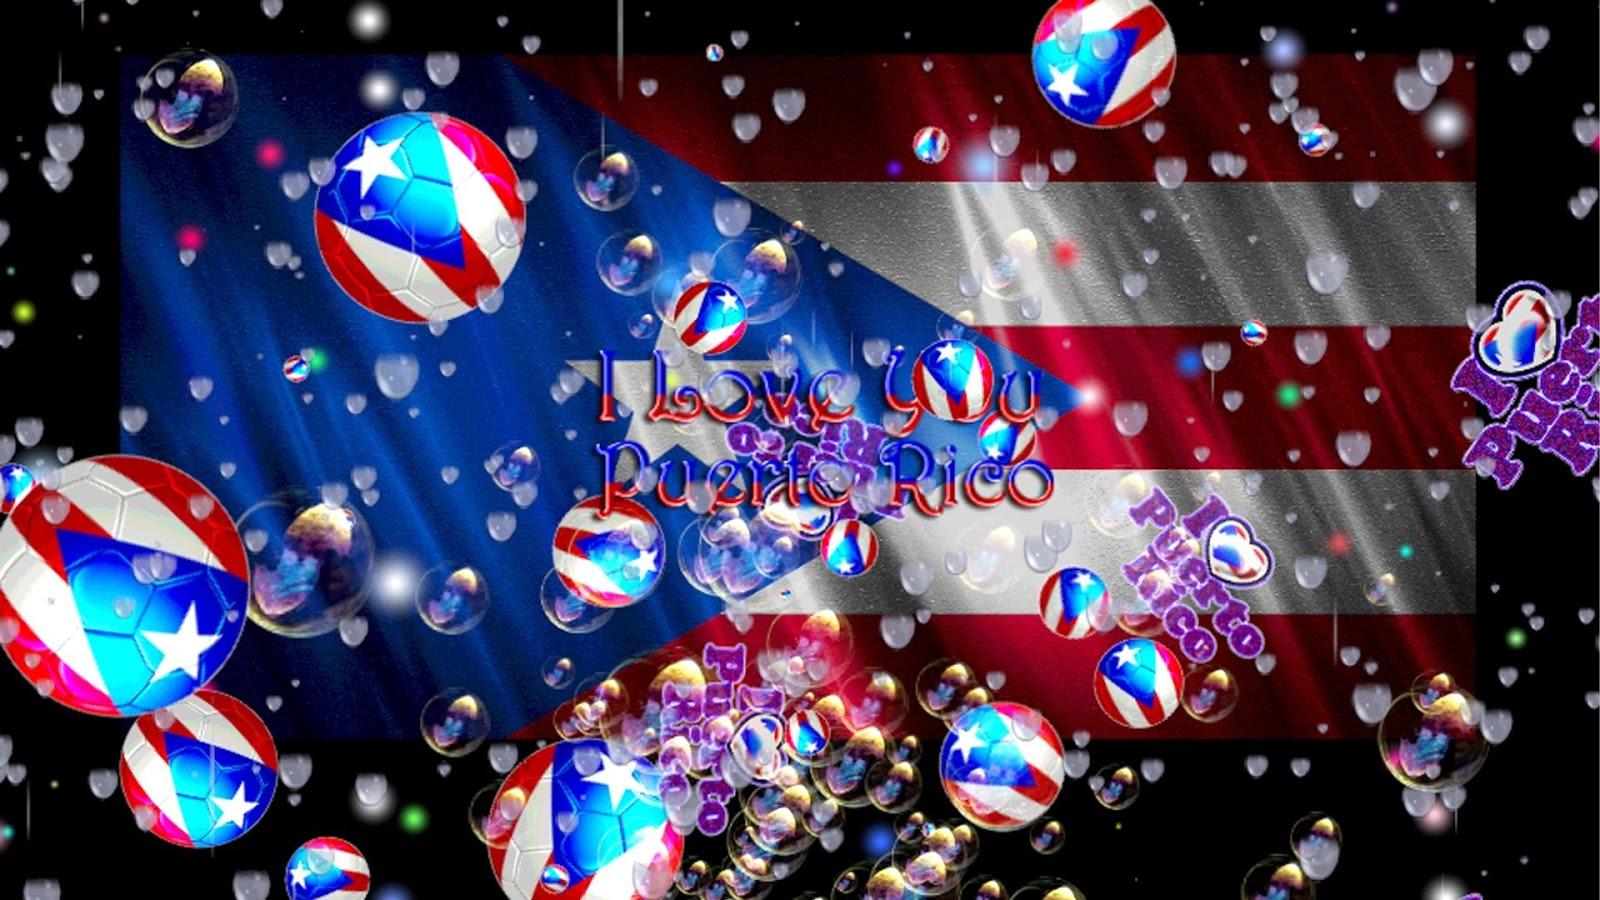 Free Puerto Rico Wallpaper Sf Wallpaper